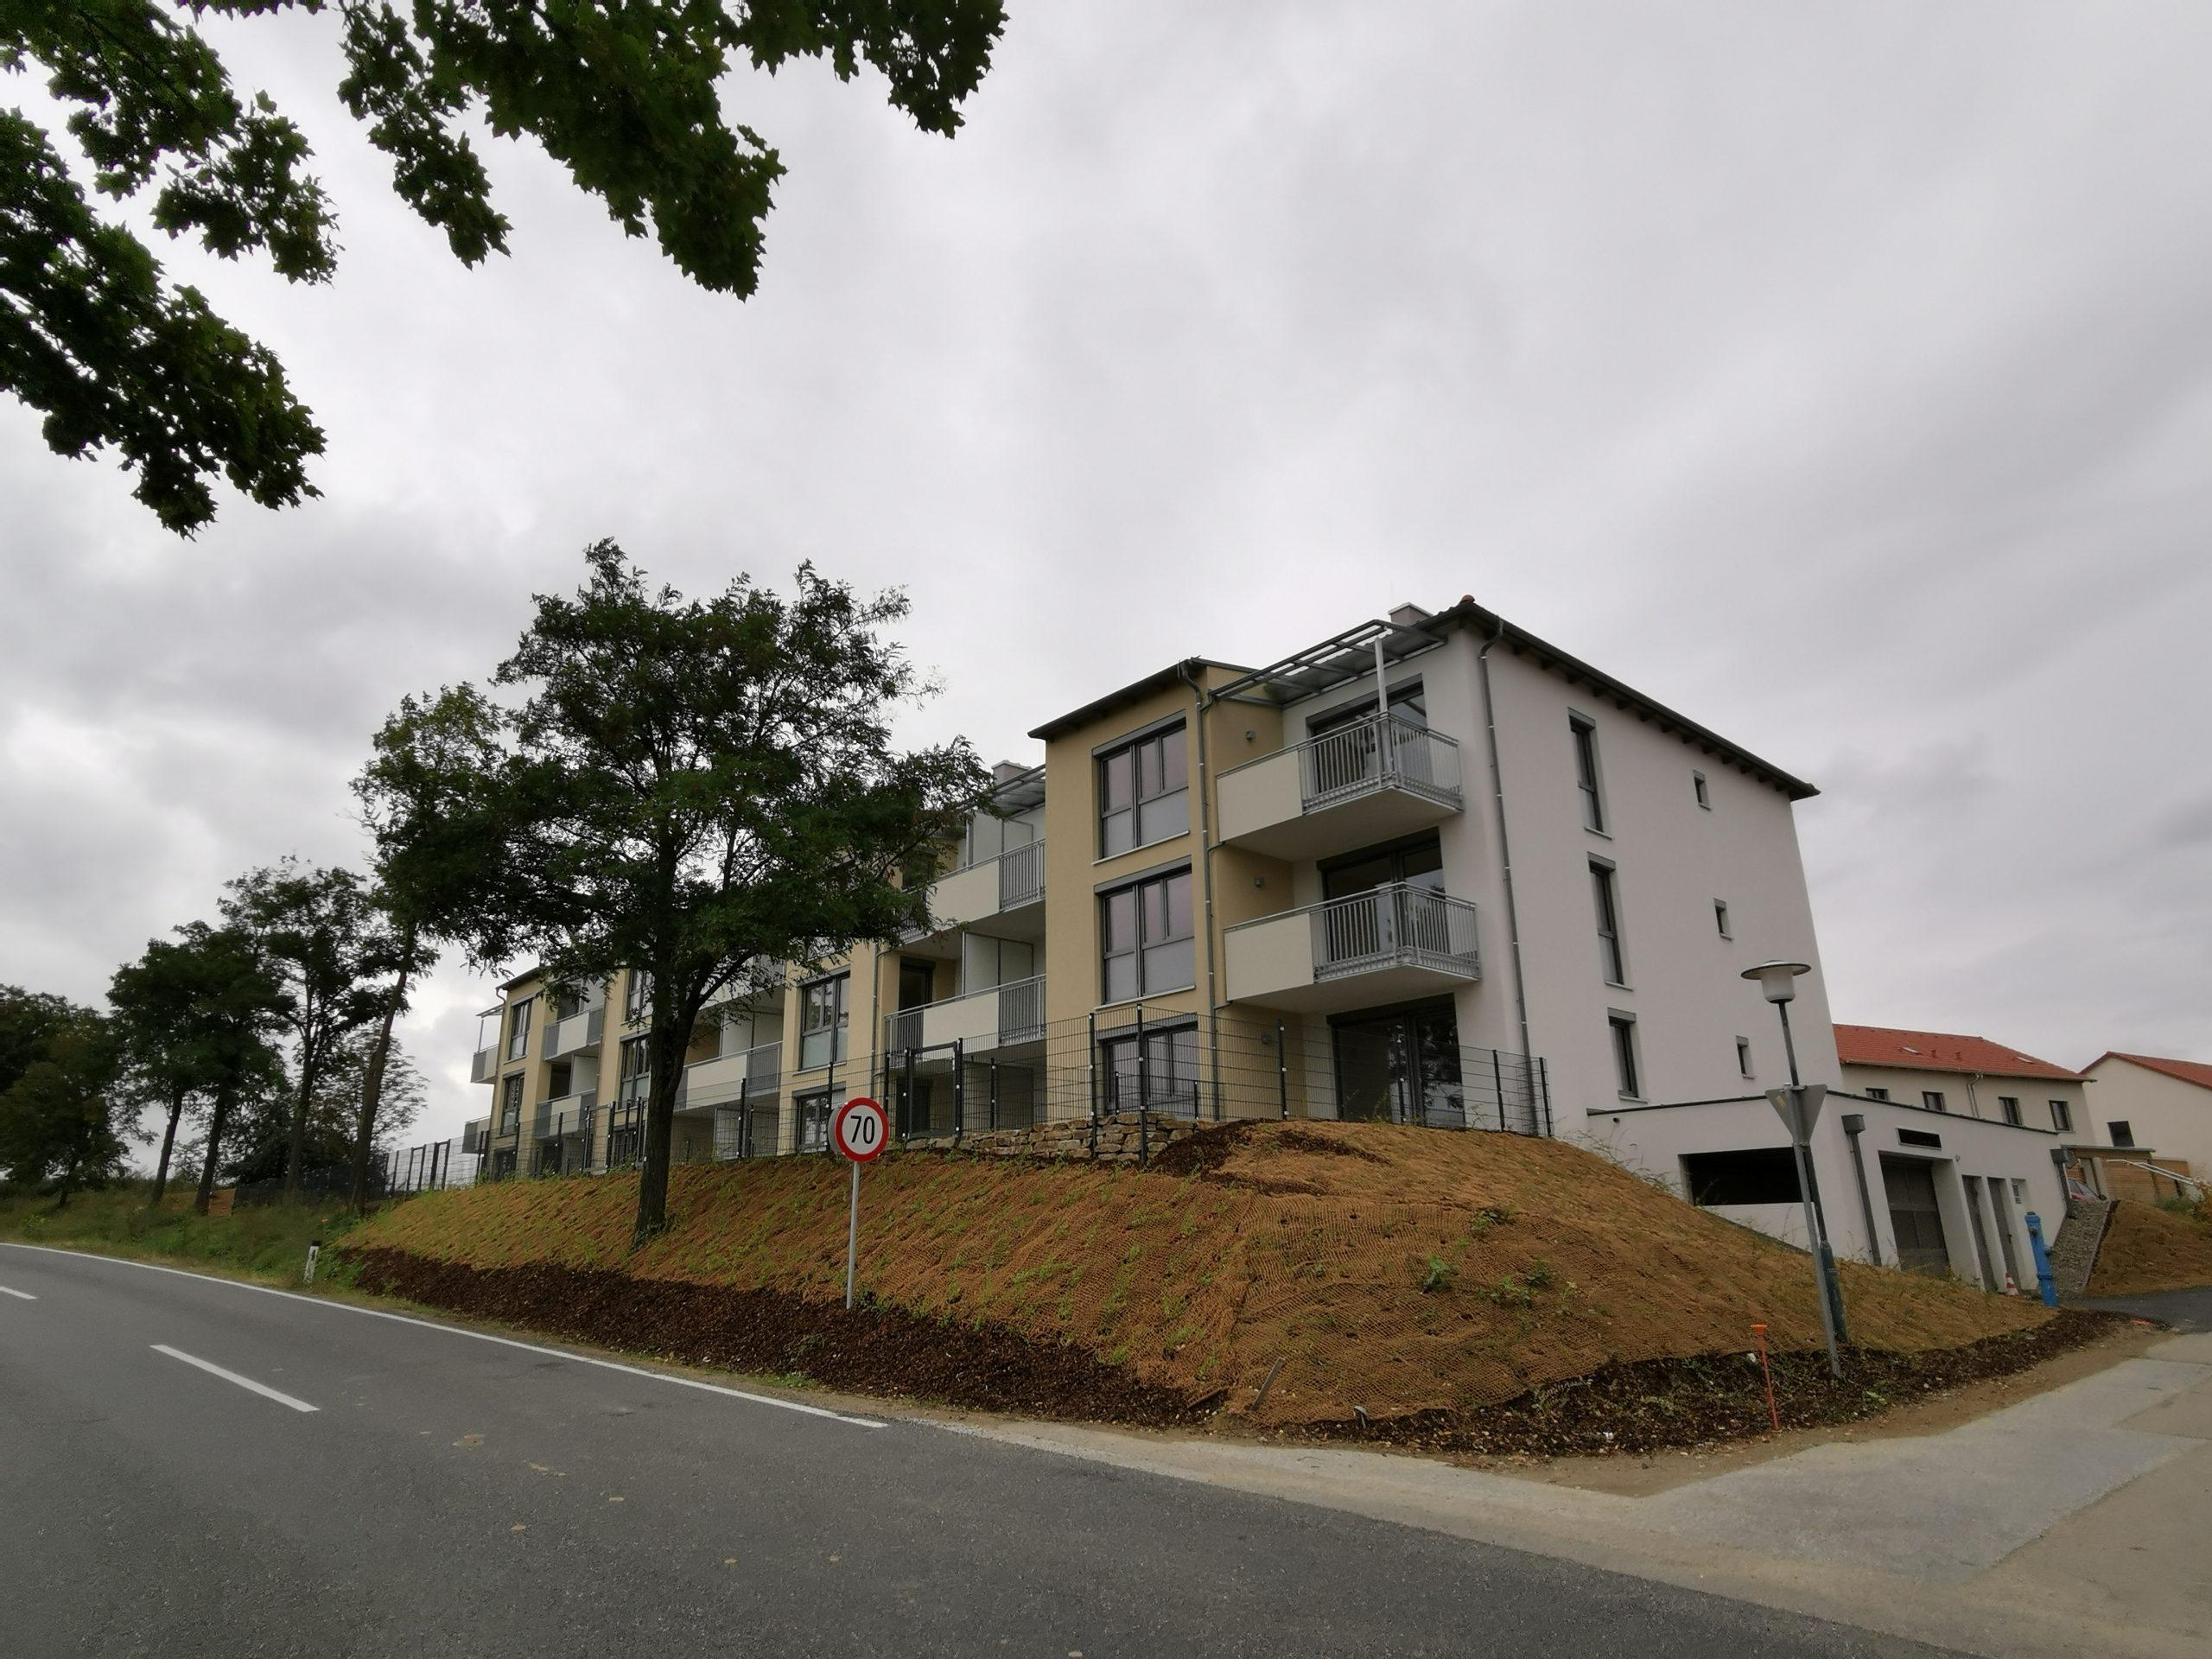 Immobilie von Kamptal in 3730 Eggenburg, Horn, Eggenburg VII - Top 107 #11